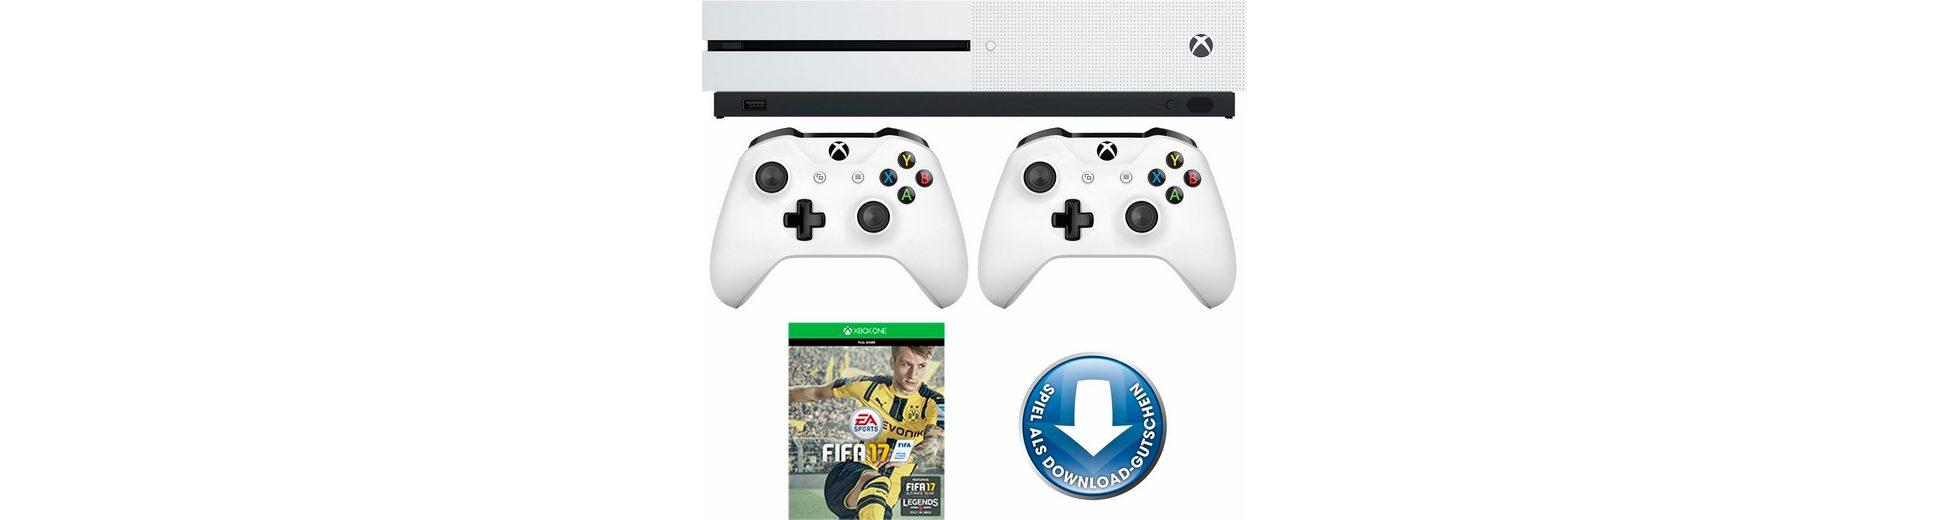 Xbox One S 500GB + FIFA 17 (DLC) + 2. Controller, 4K Ultra HD